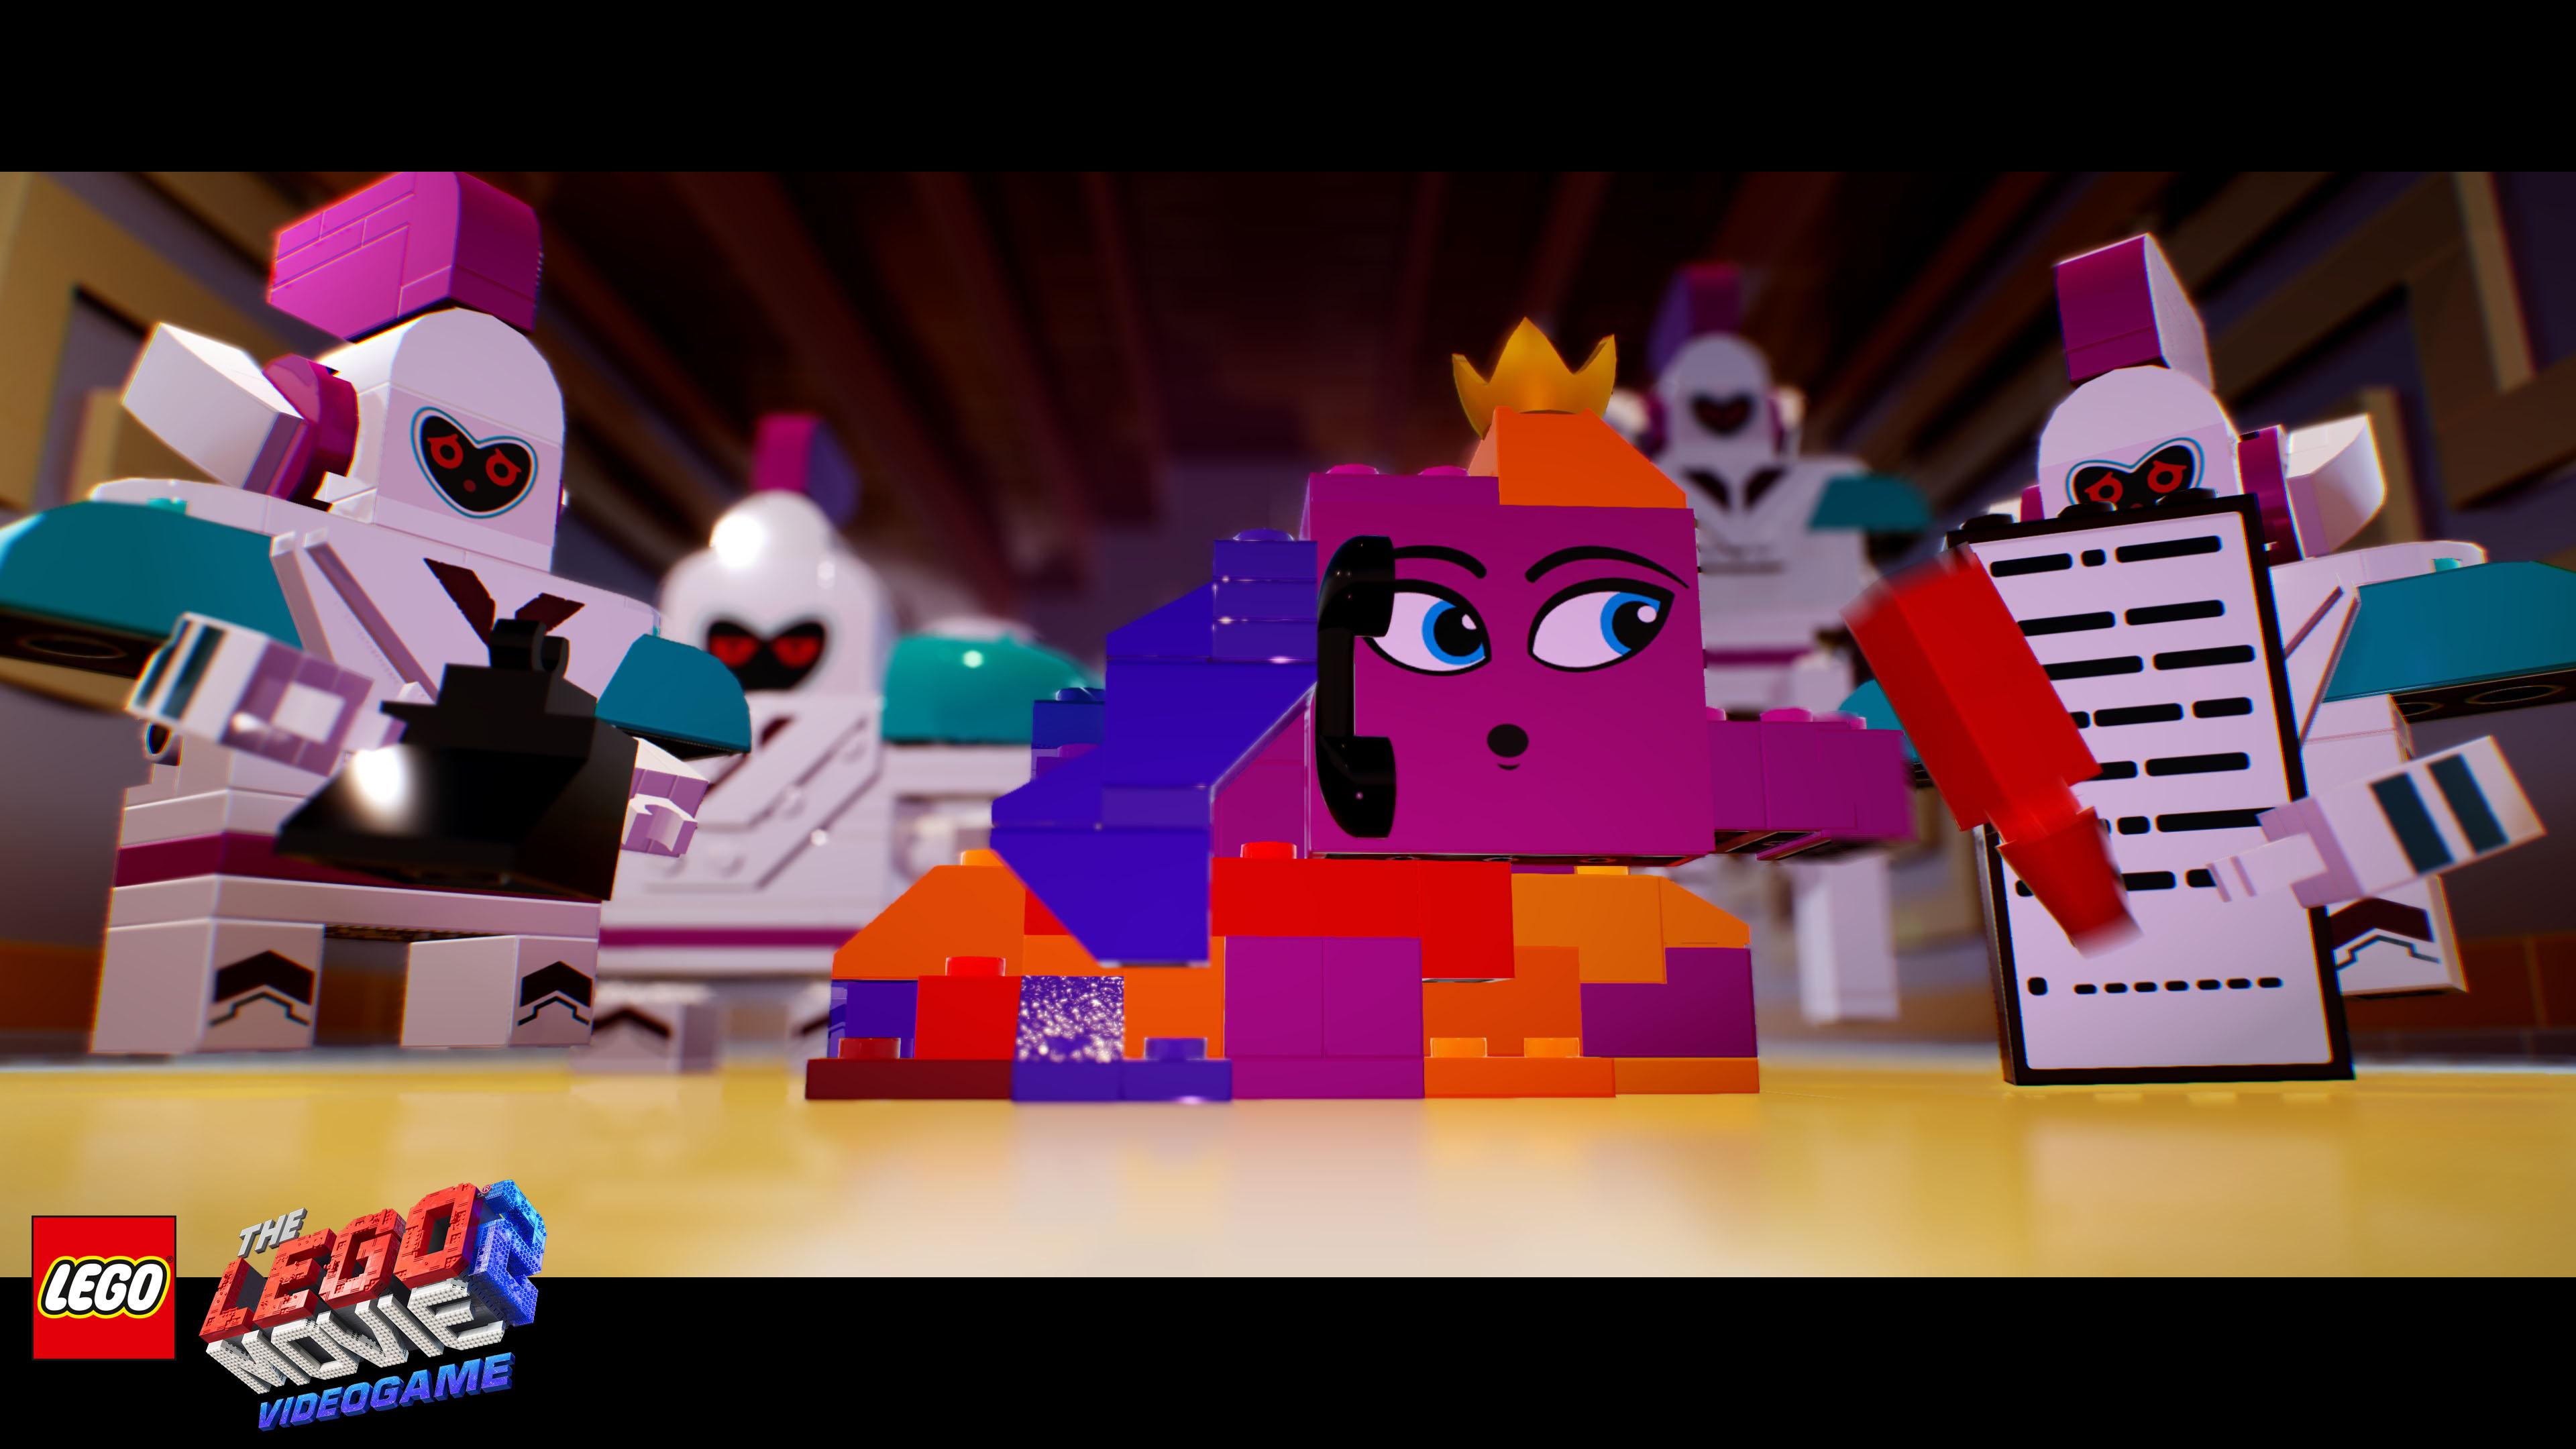 Daily Briefs Feb 26 Round 3 Yoshi My Nintendo Japan The Lego Movie 2 Videogame Perfectly Nintendo